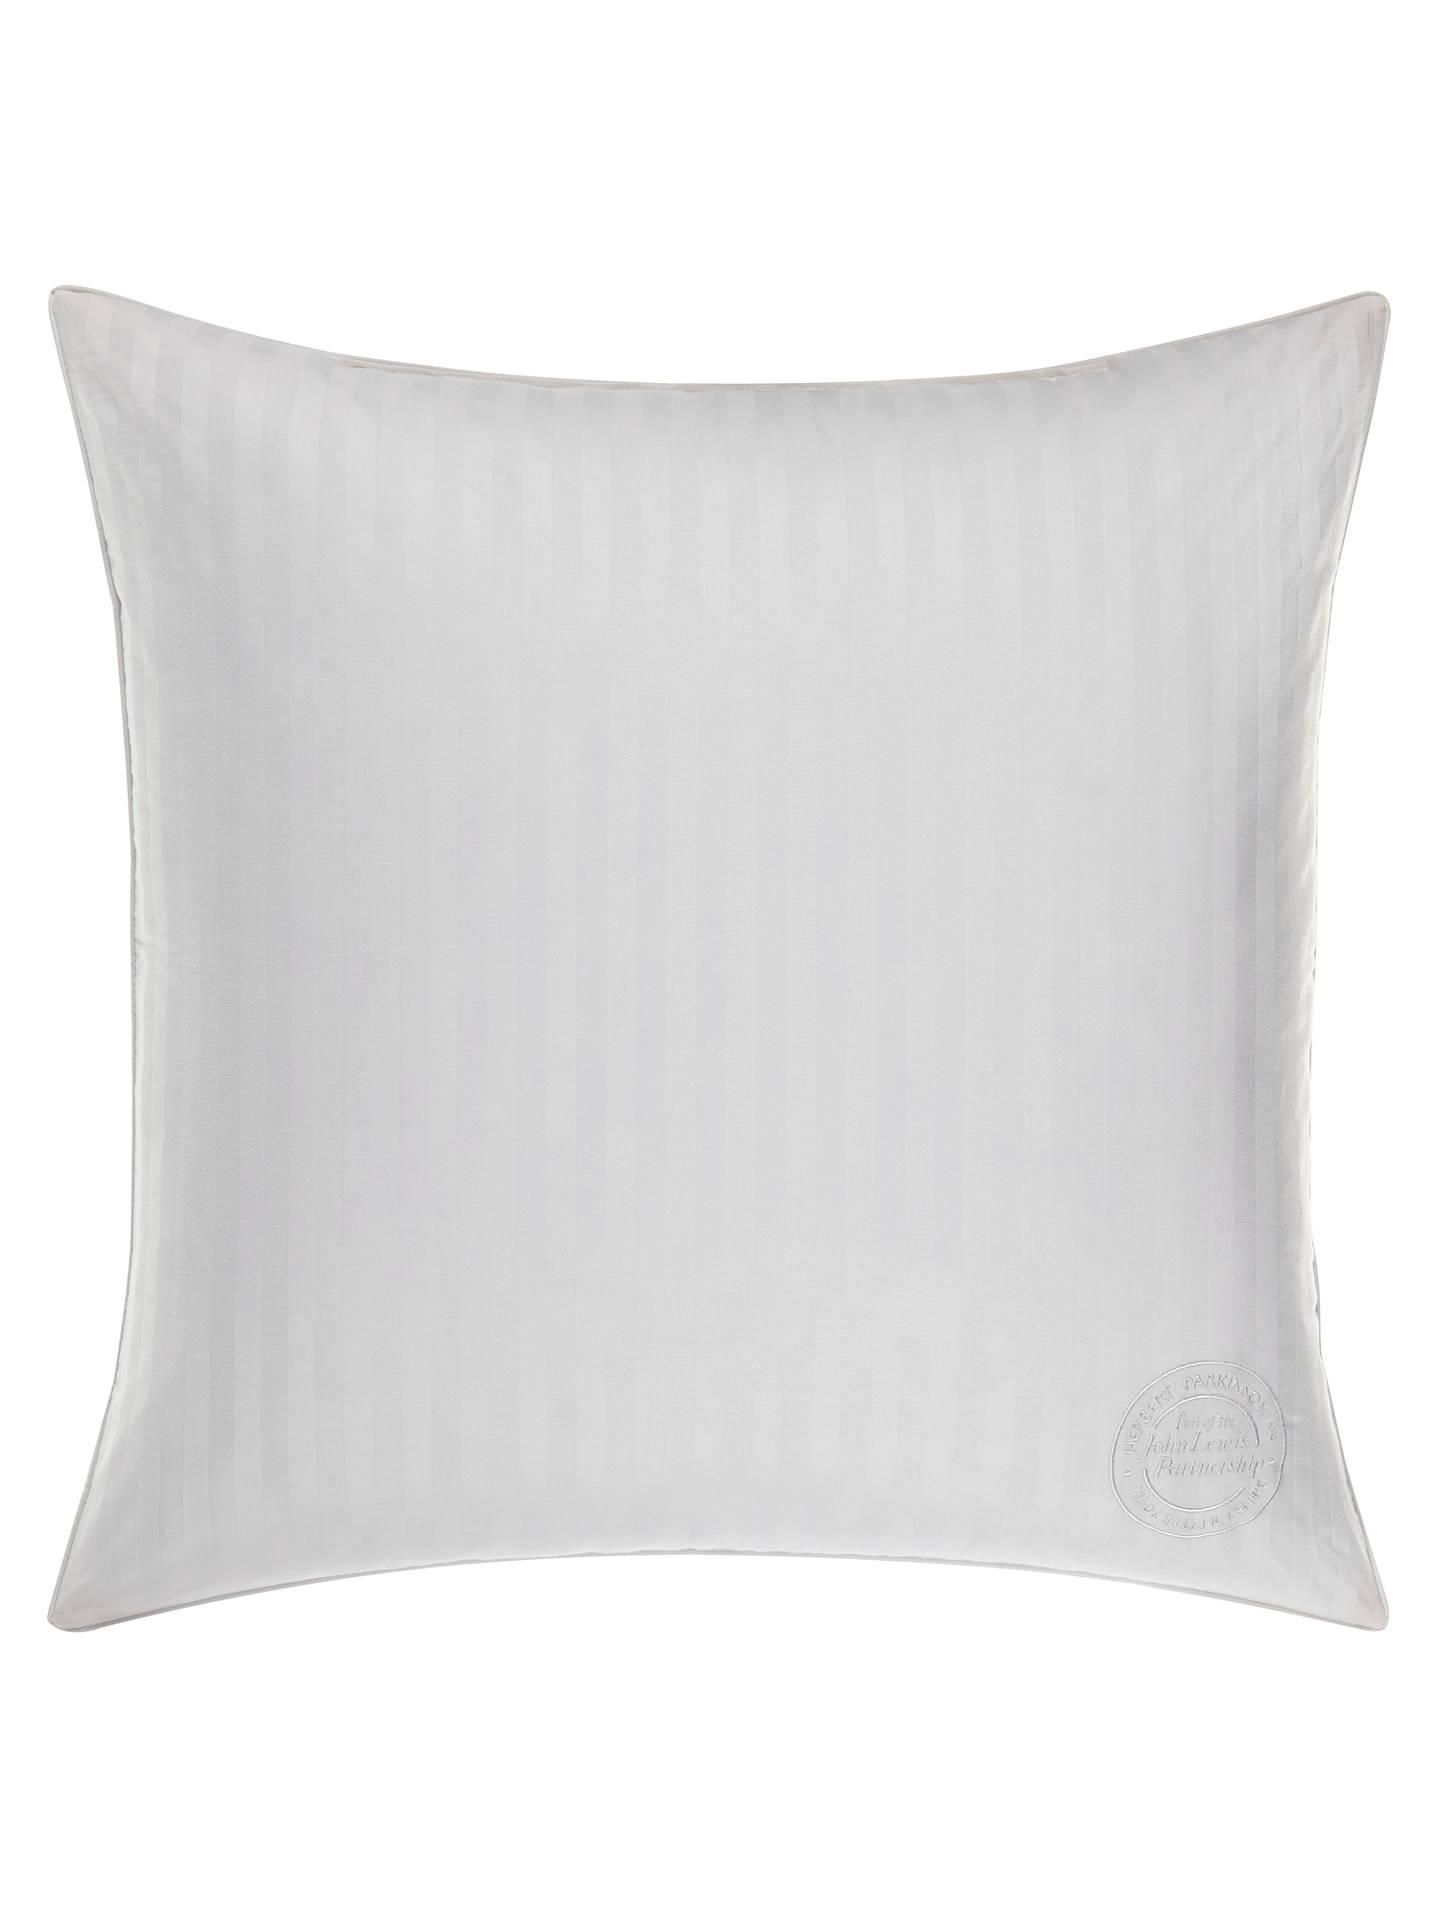 john lewis partners premium siberian goose feather and. Black Bedroom Furniture Sets. Home Design Ideas